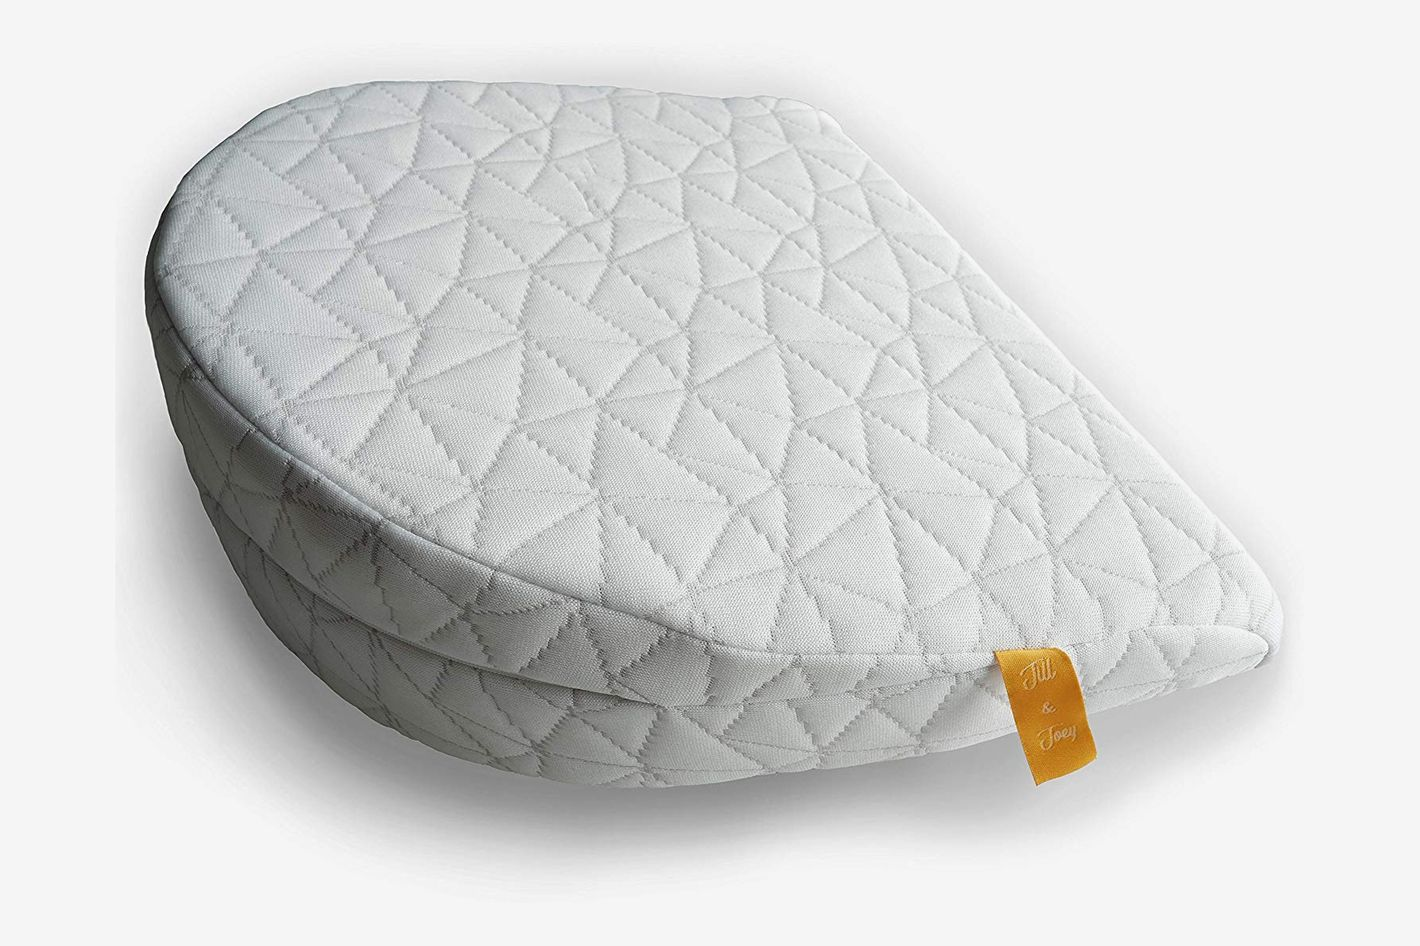 Jill & Joey Pregnancy Pillow Wedge